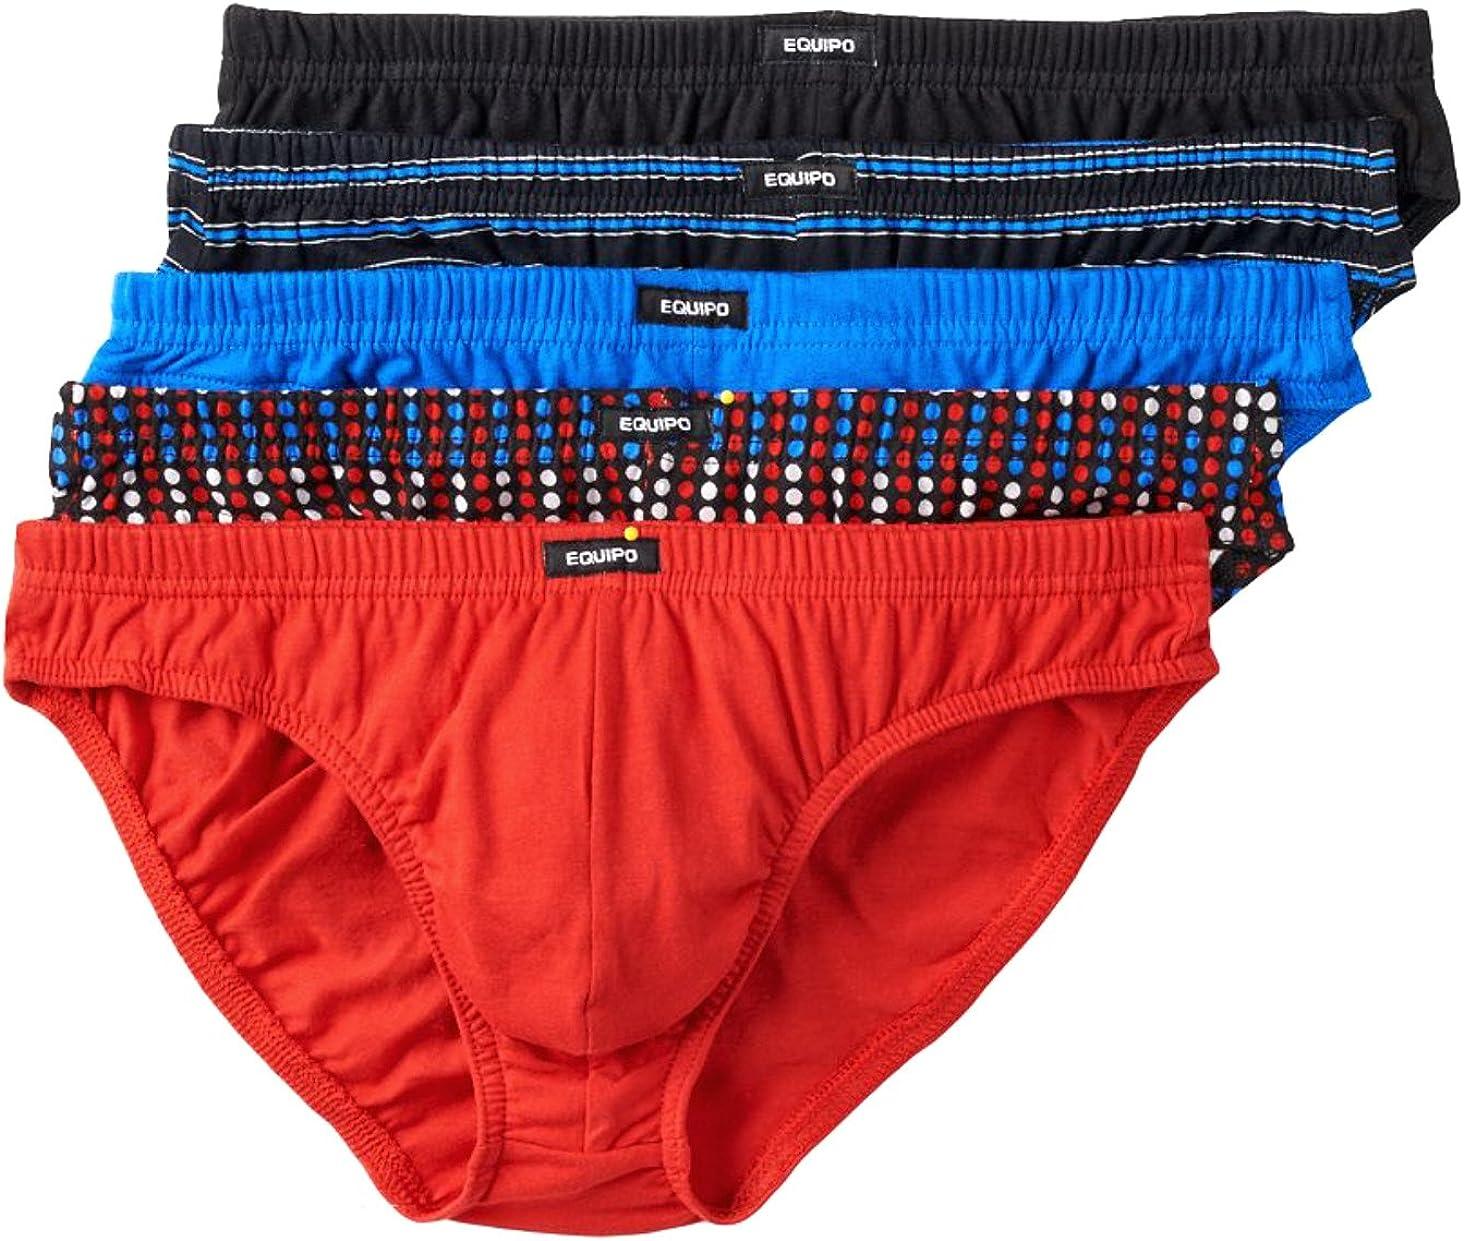 Men`s equipo bikinis briefs underwear 5-pk Medium at Amazon Men's Clothing  store